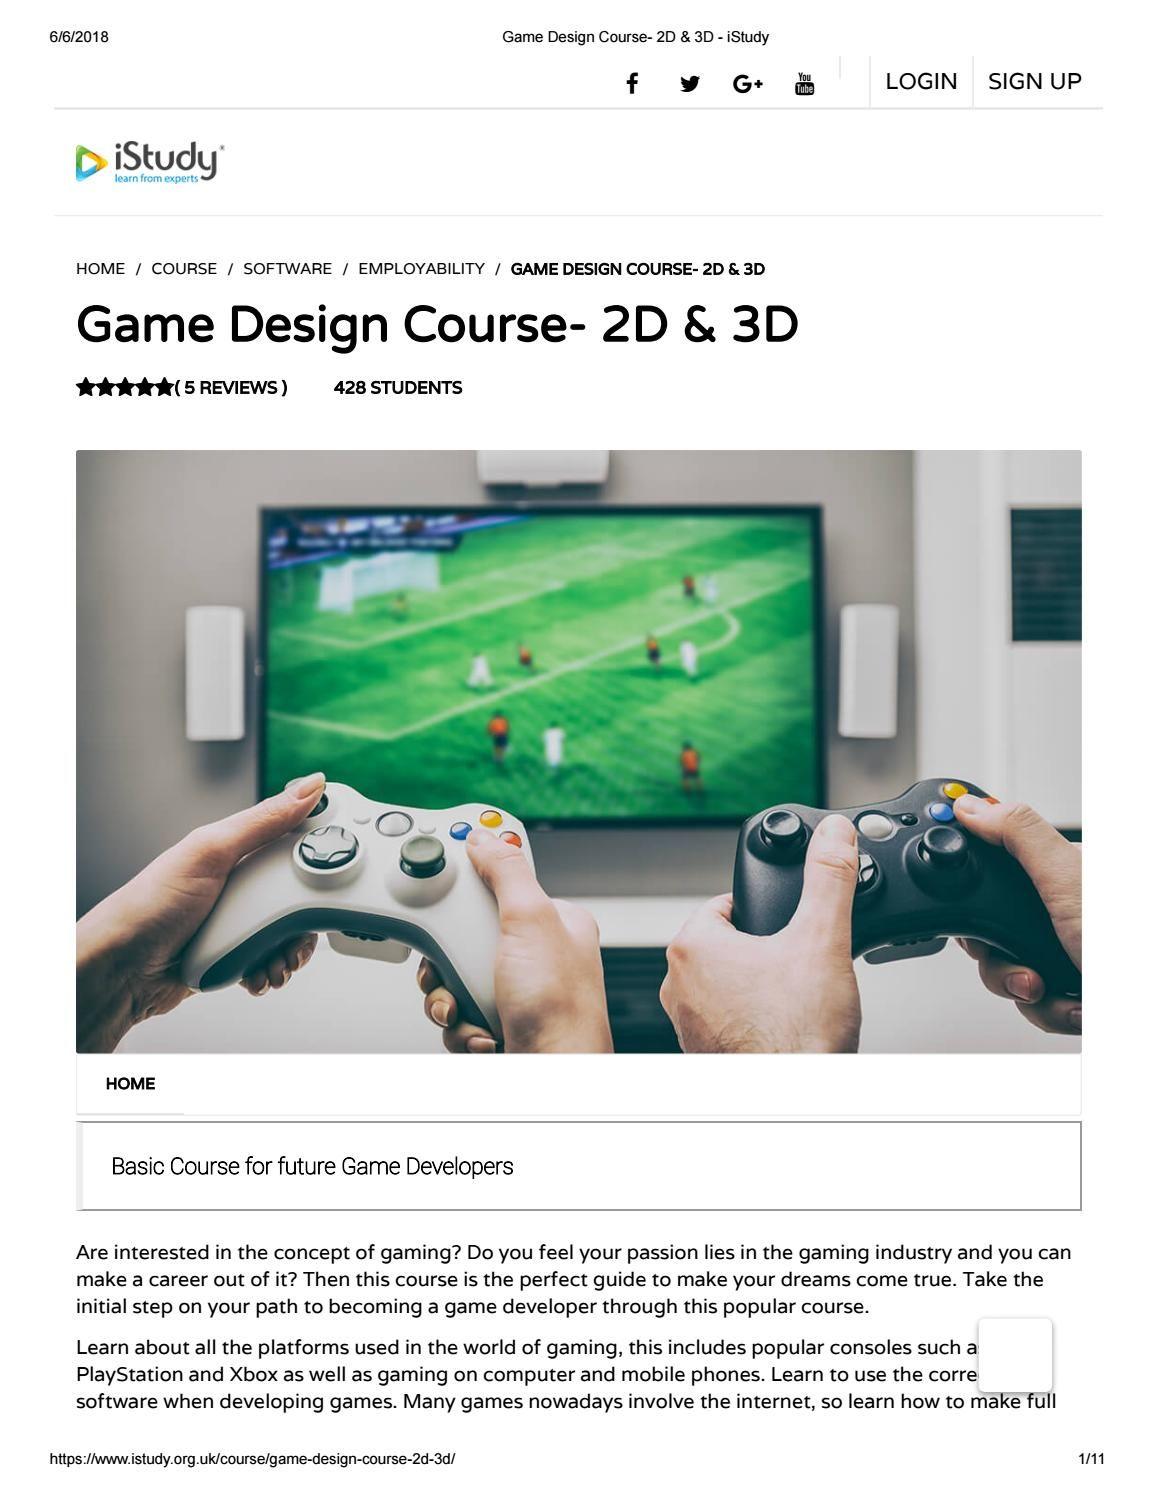 Game design course 2d & 3d istudy Design course, Game